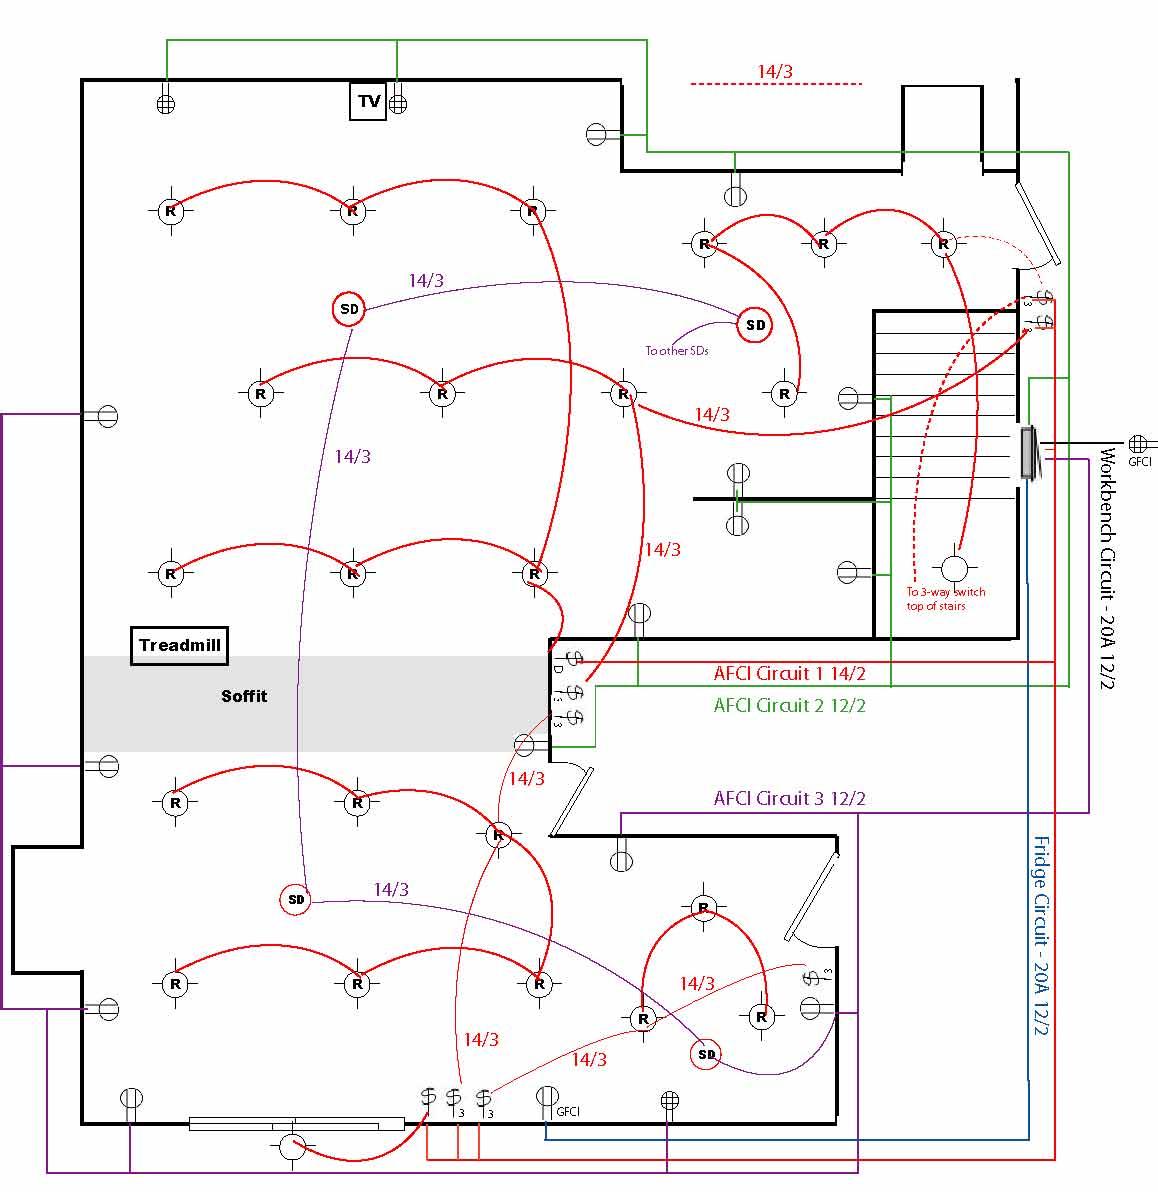 Electrical Symbols For House Plans Uk,Symbols.Home Plans Ideas Picture